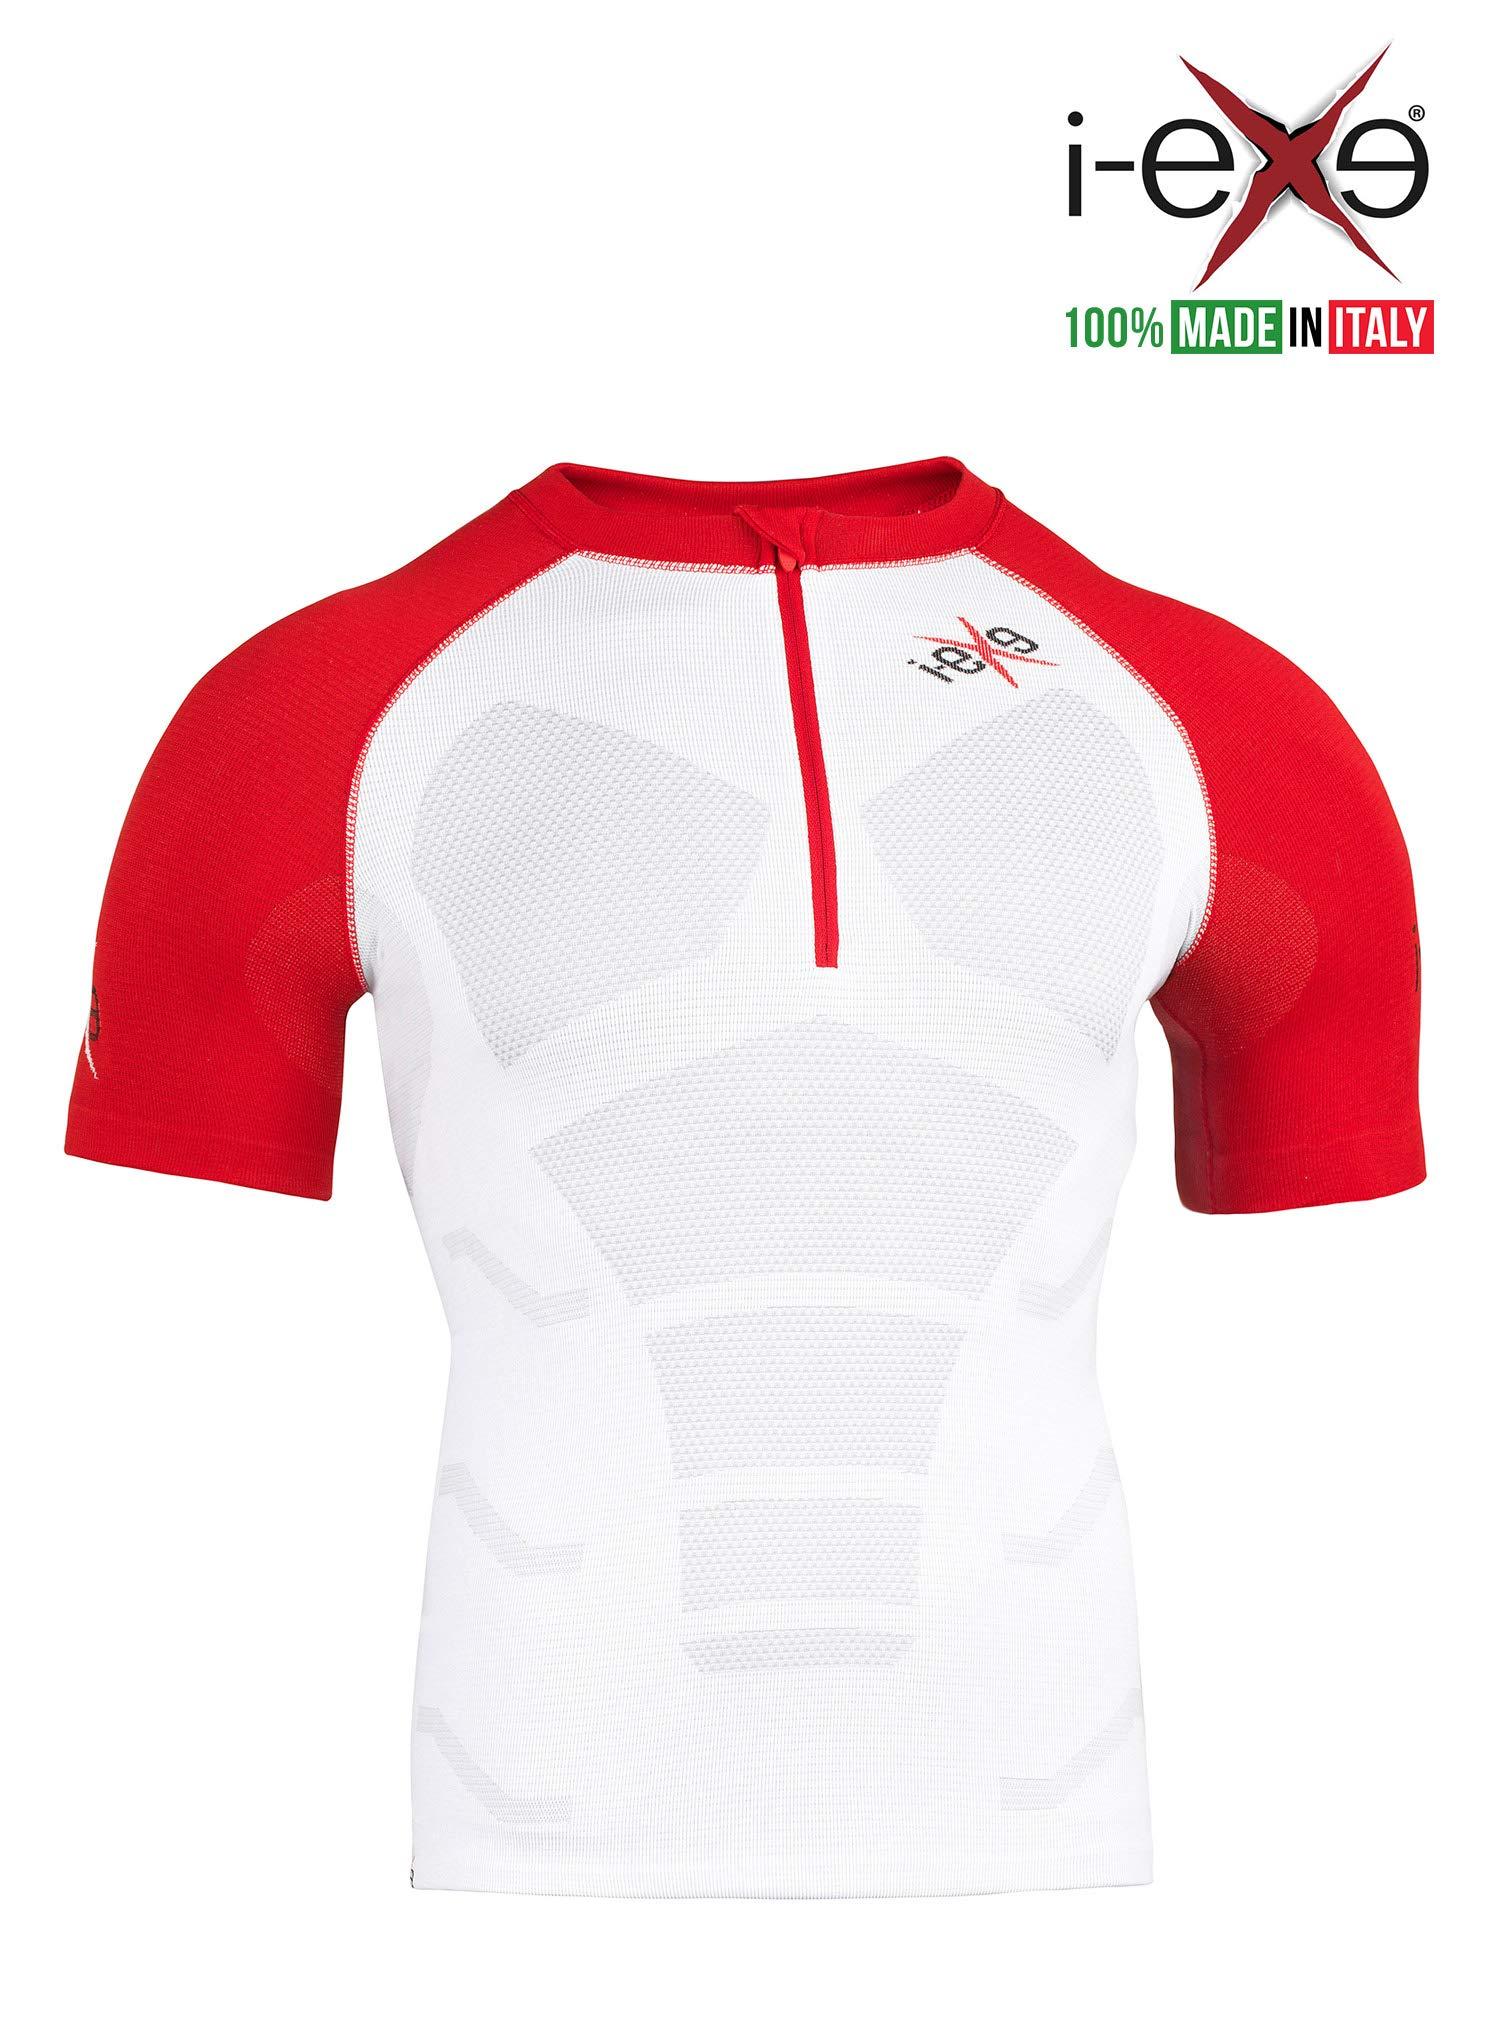 I-EXE Mens T-Shirt. Color: White, Size: Small/Medium